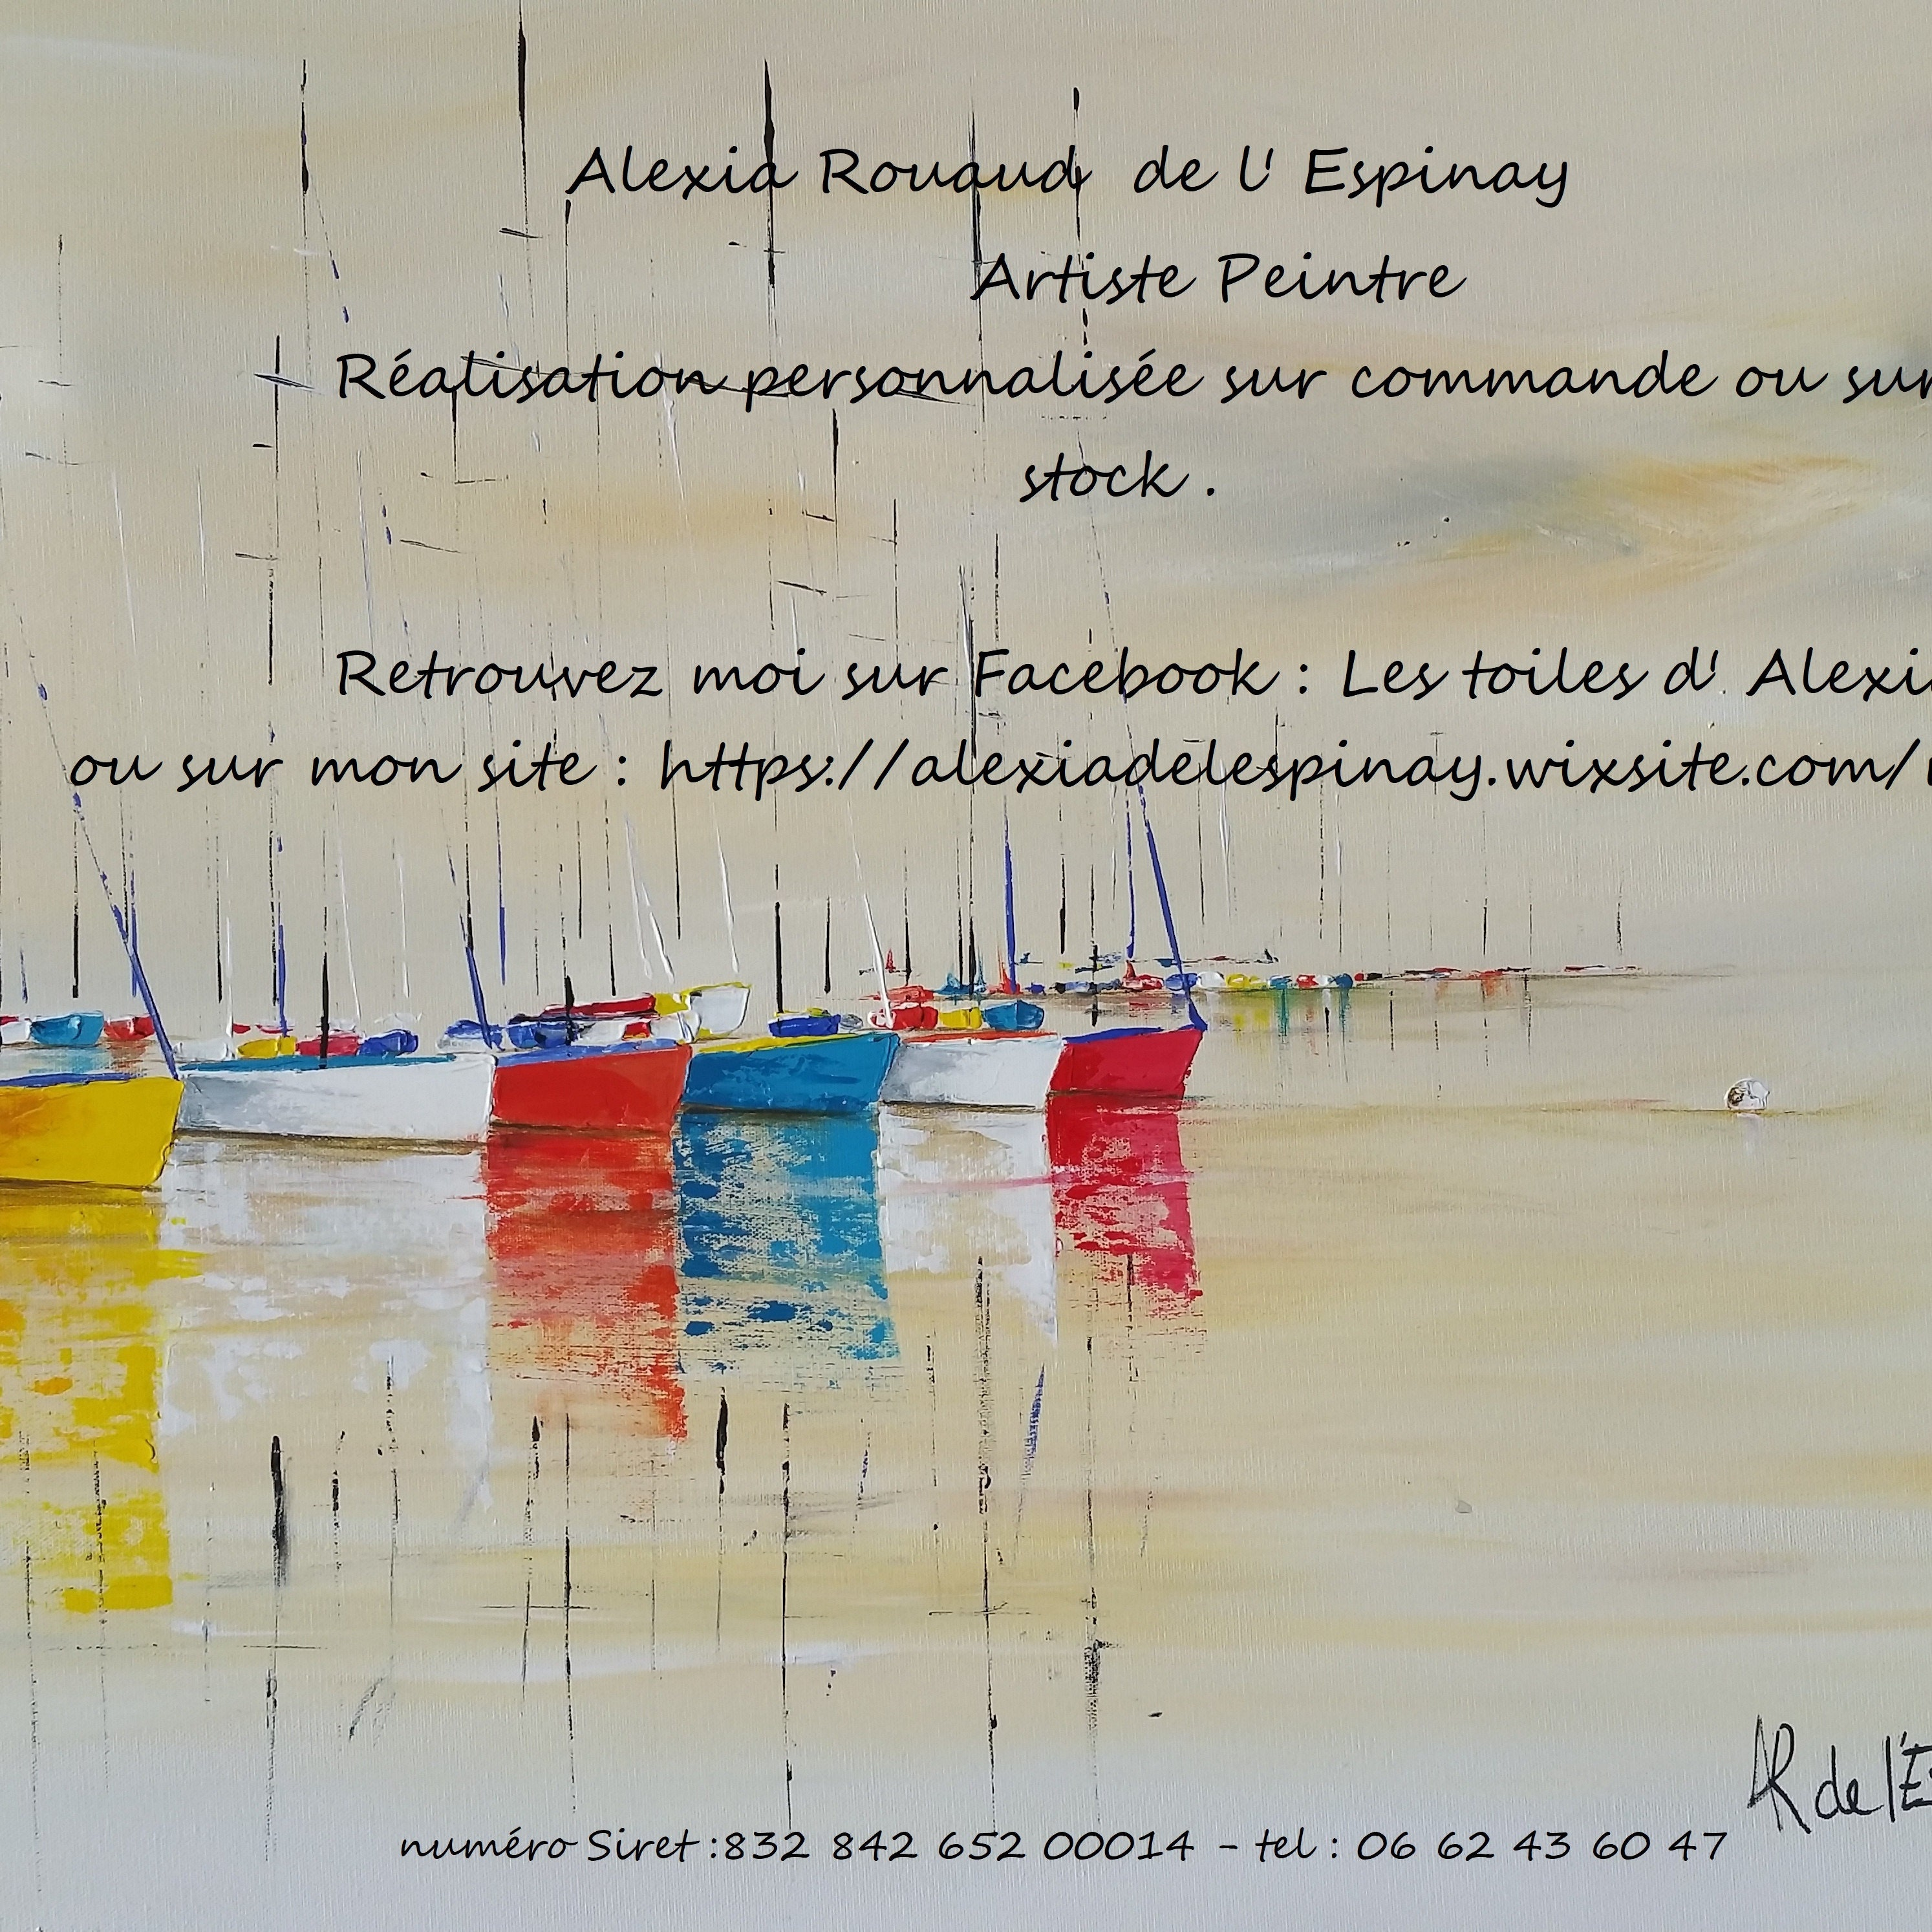 Site Des Artistes Peintres décoration murale peinture acryliquelestoilesdalexia on etsy